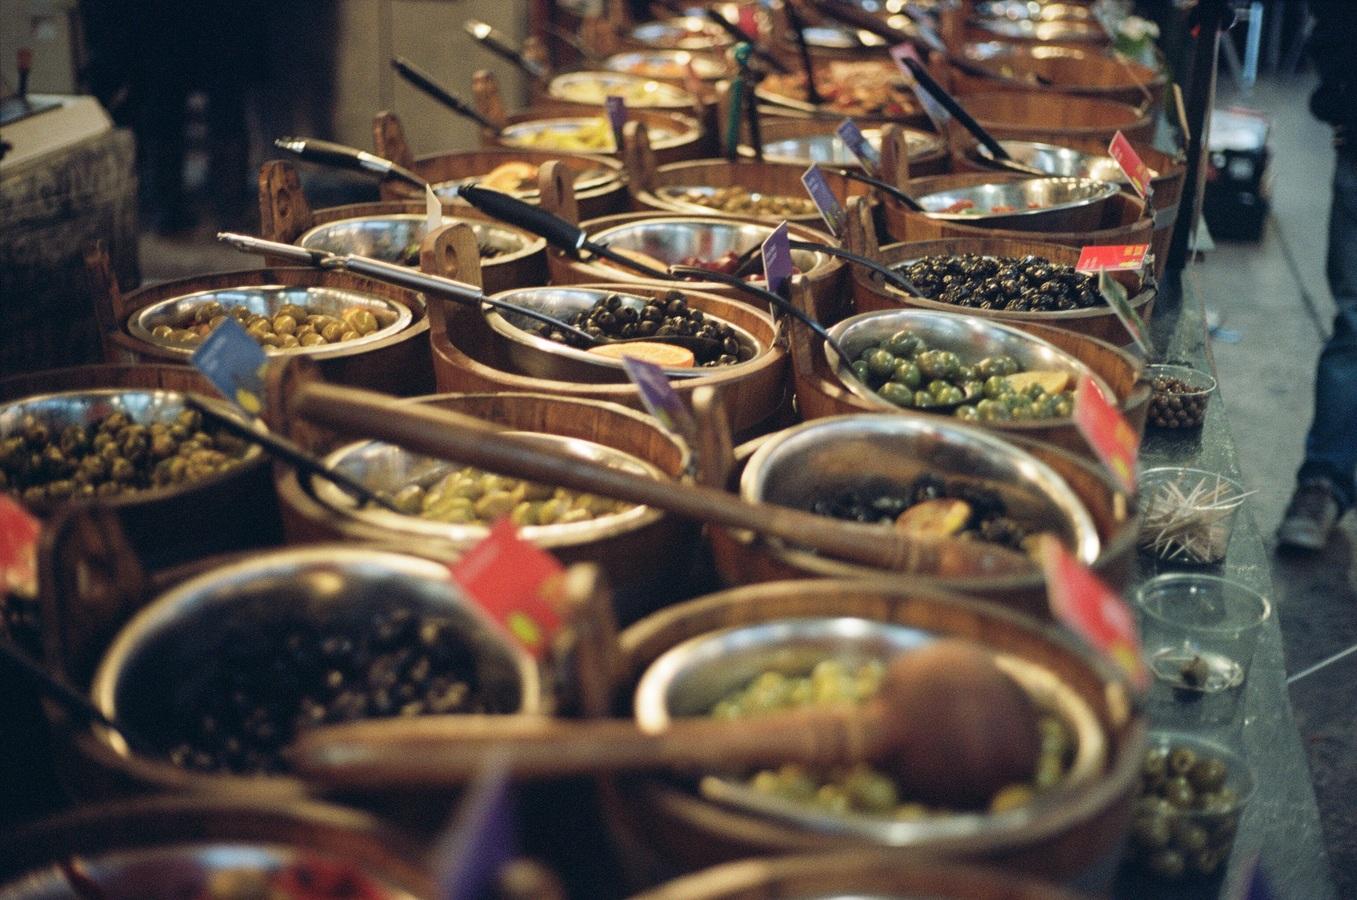 city-dish-meal-food-bazaar-market-13275-pxhere.com.jpg